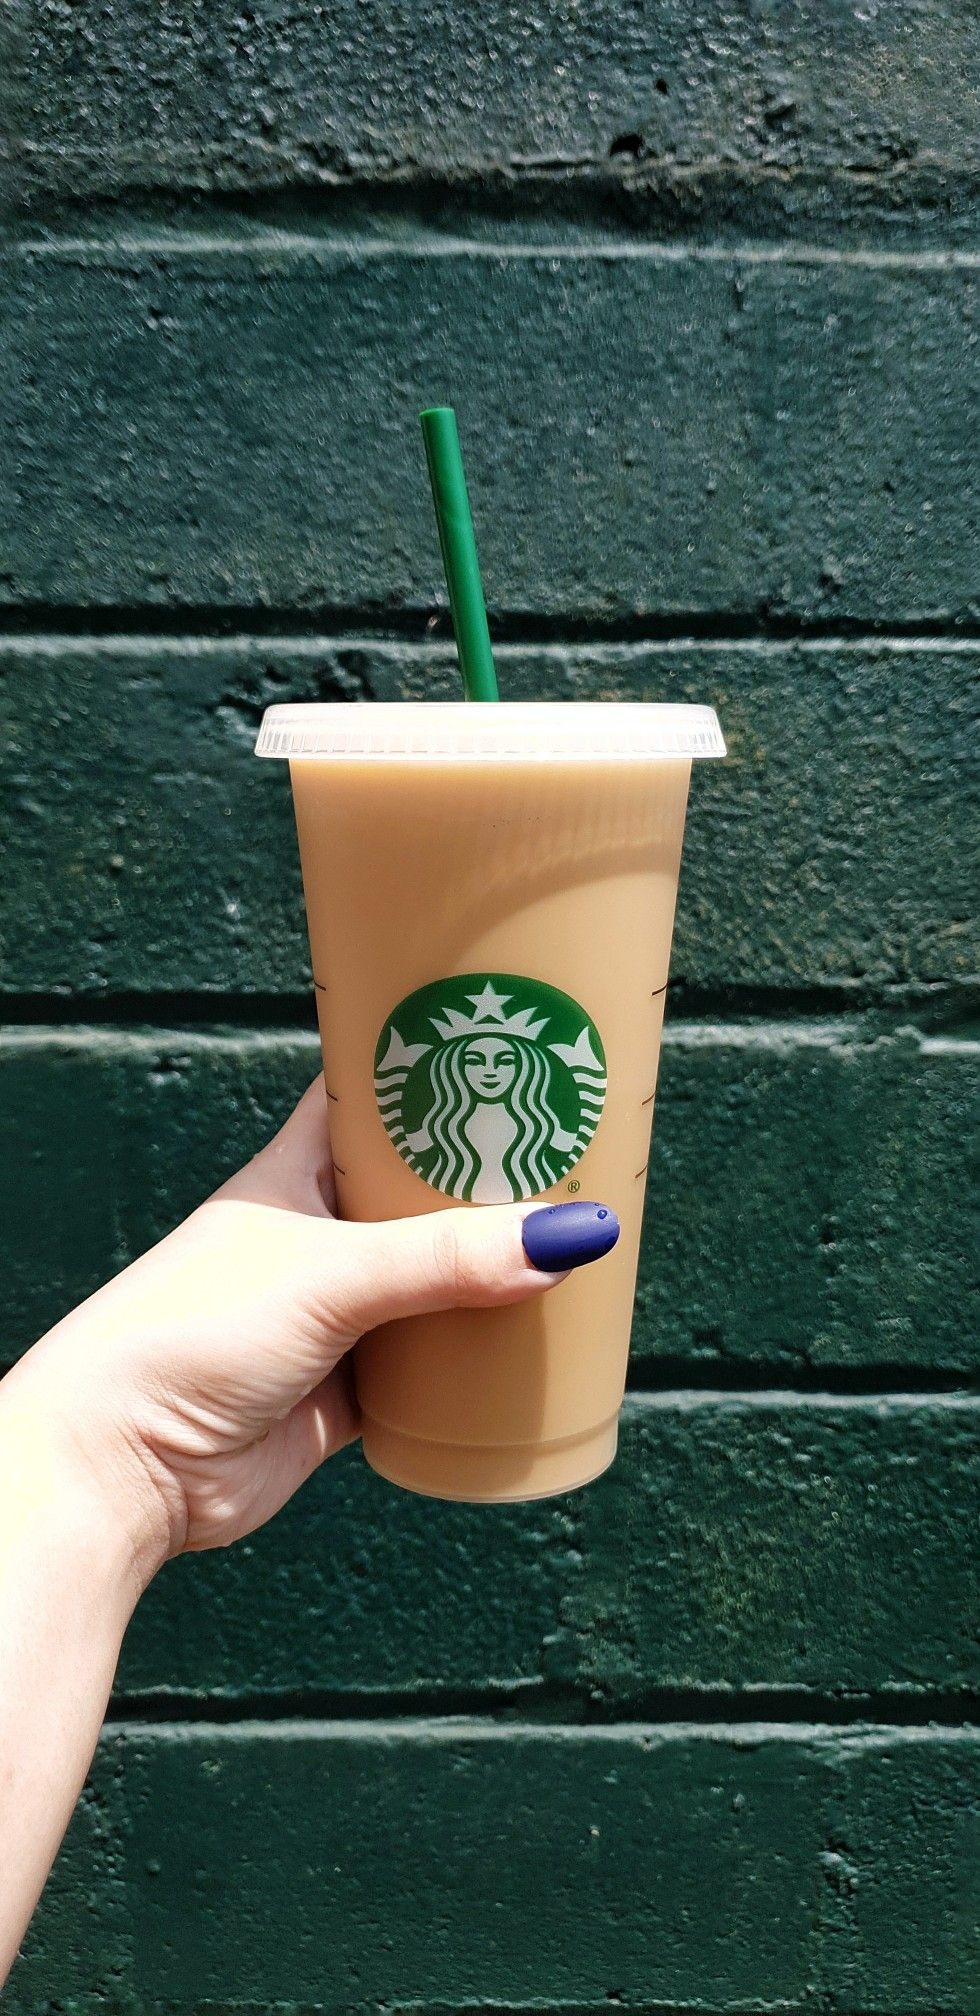 Starbuck Reusable cup Starbucks cups, Reusable cups